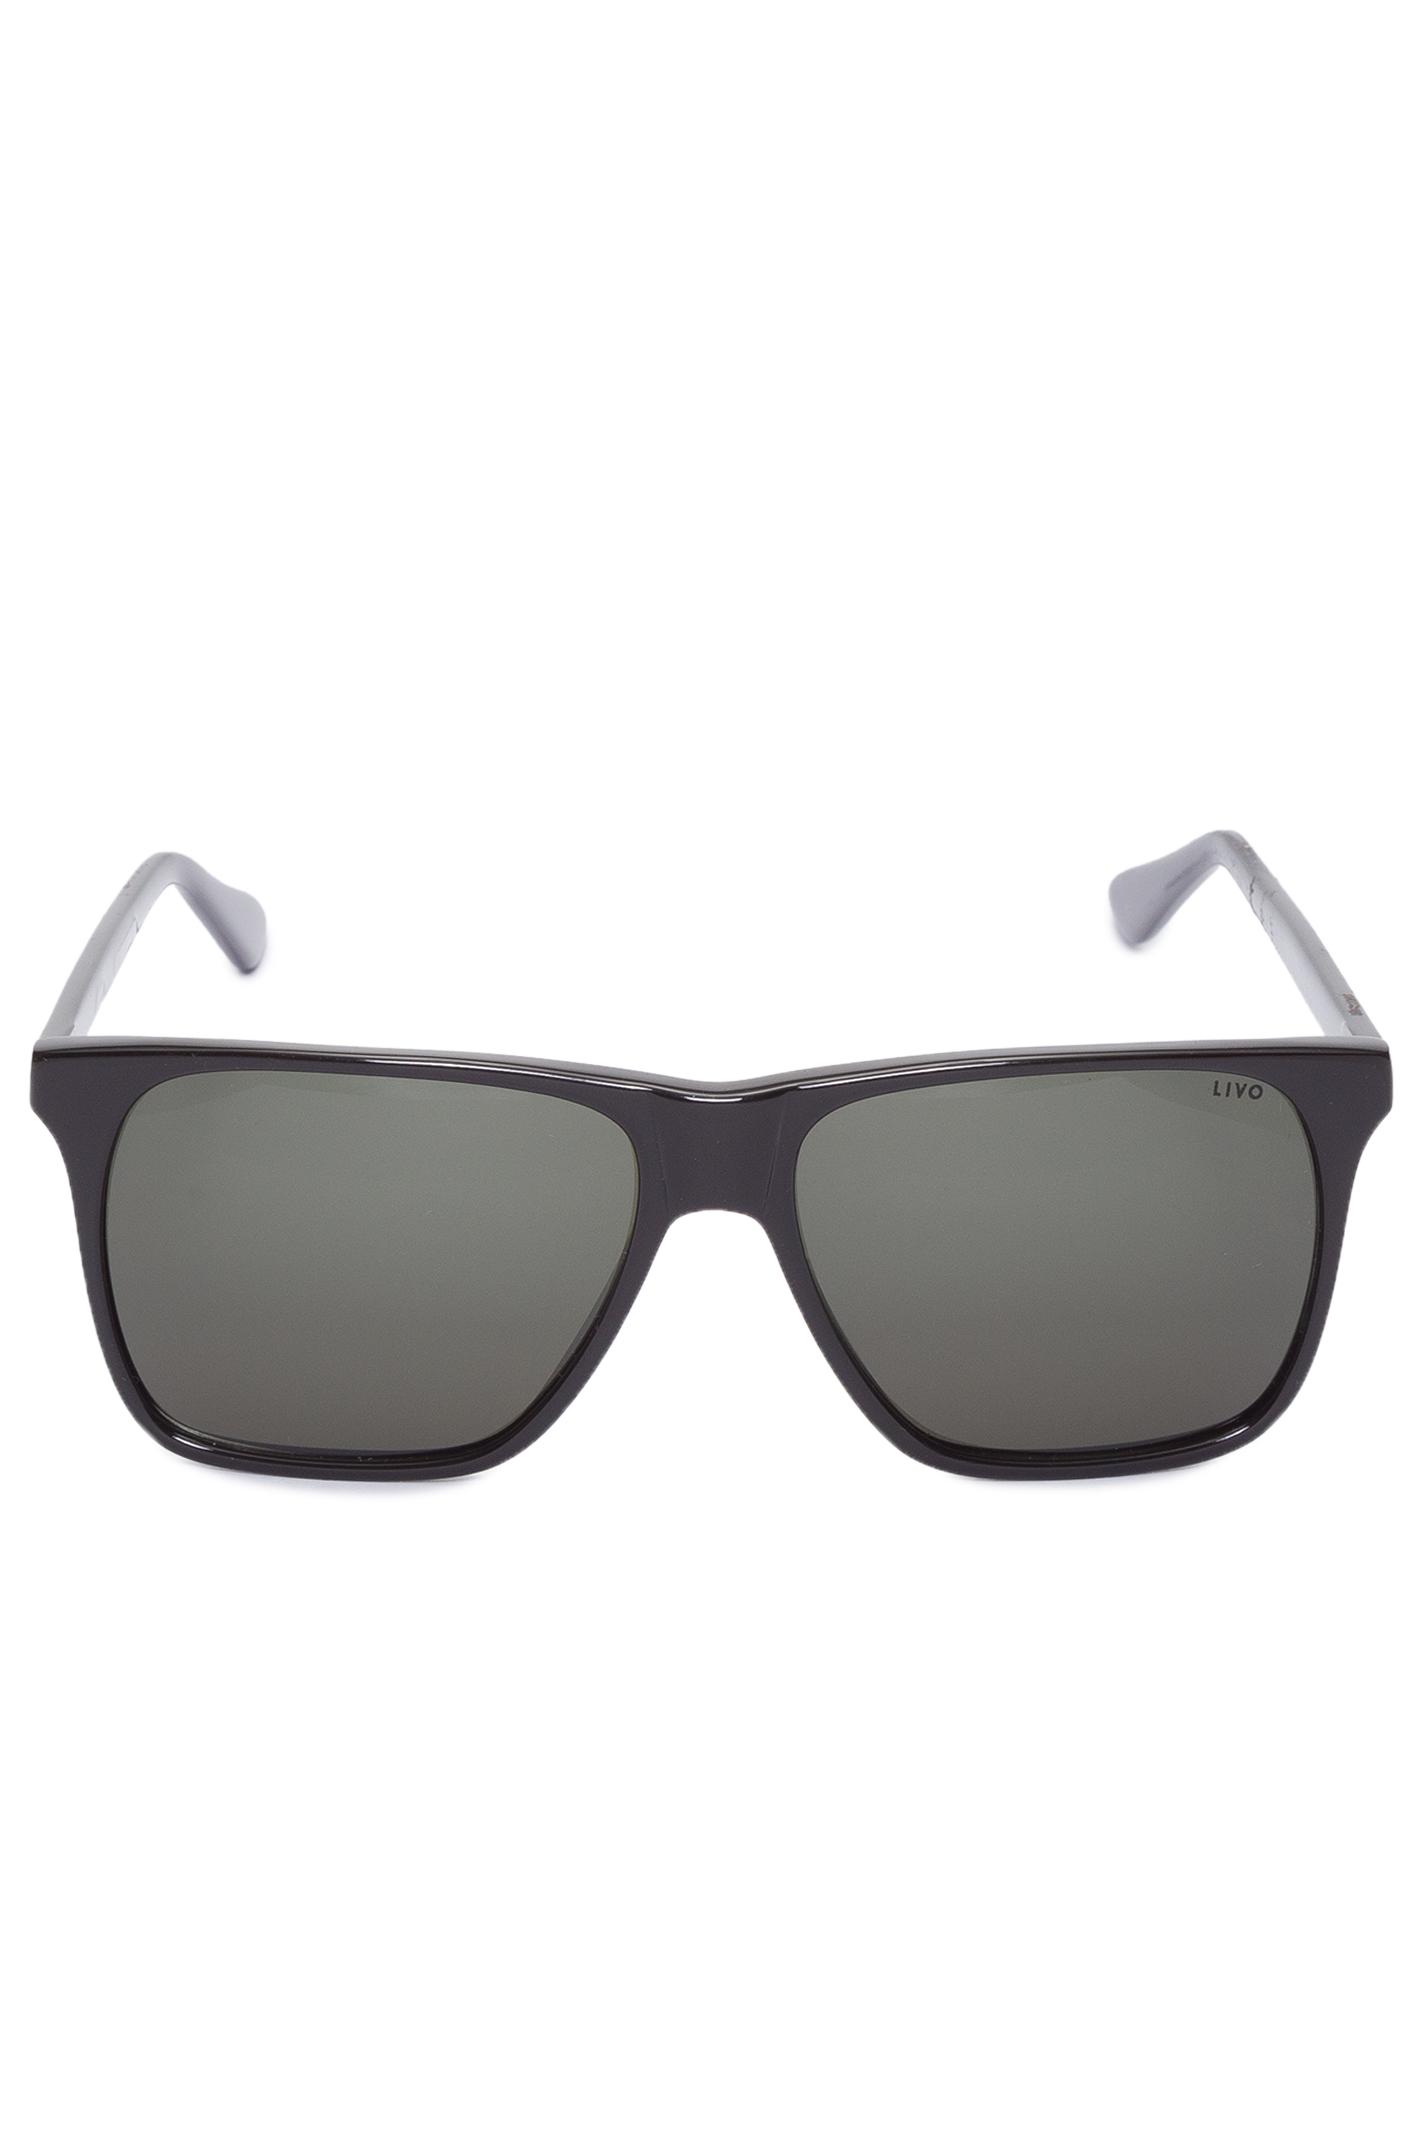 Óculos Frank Solar